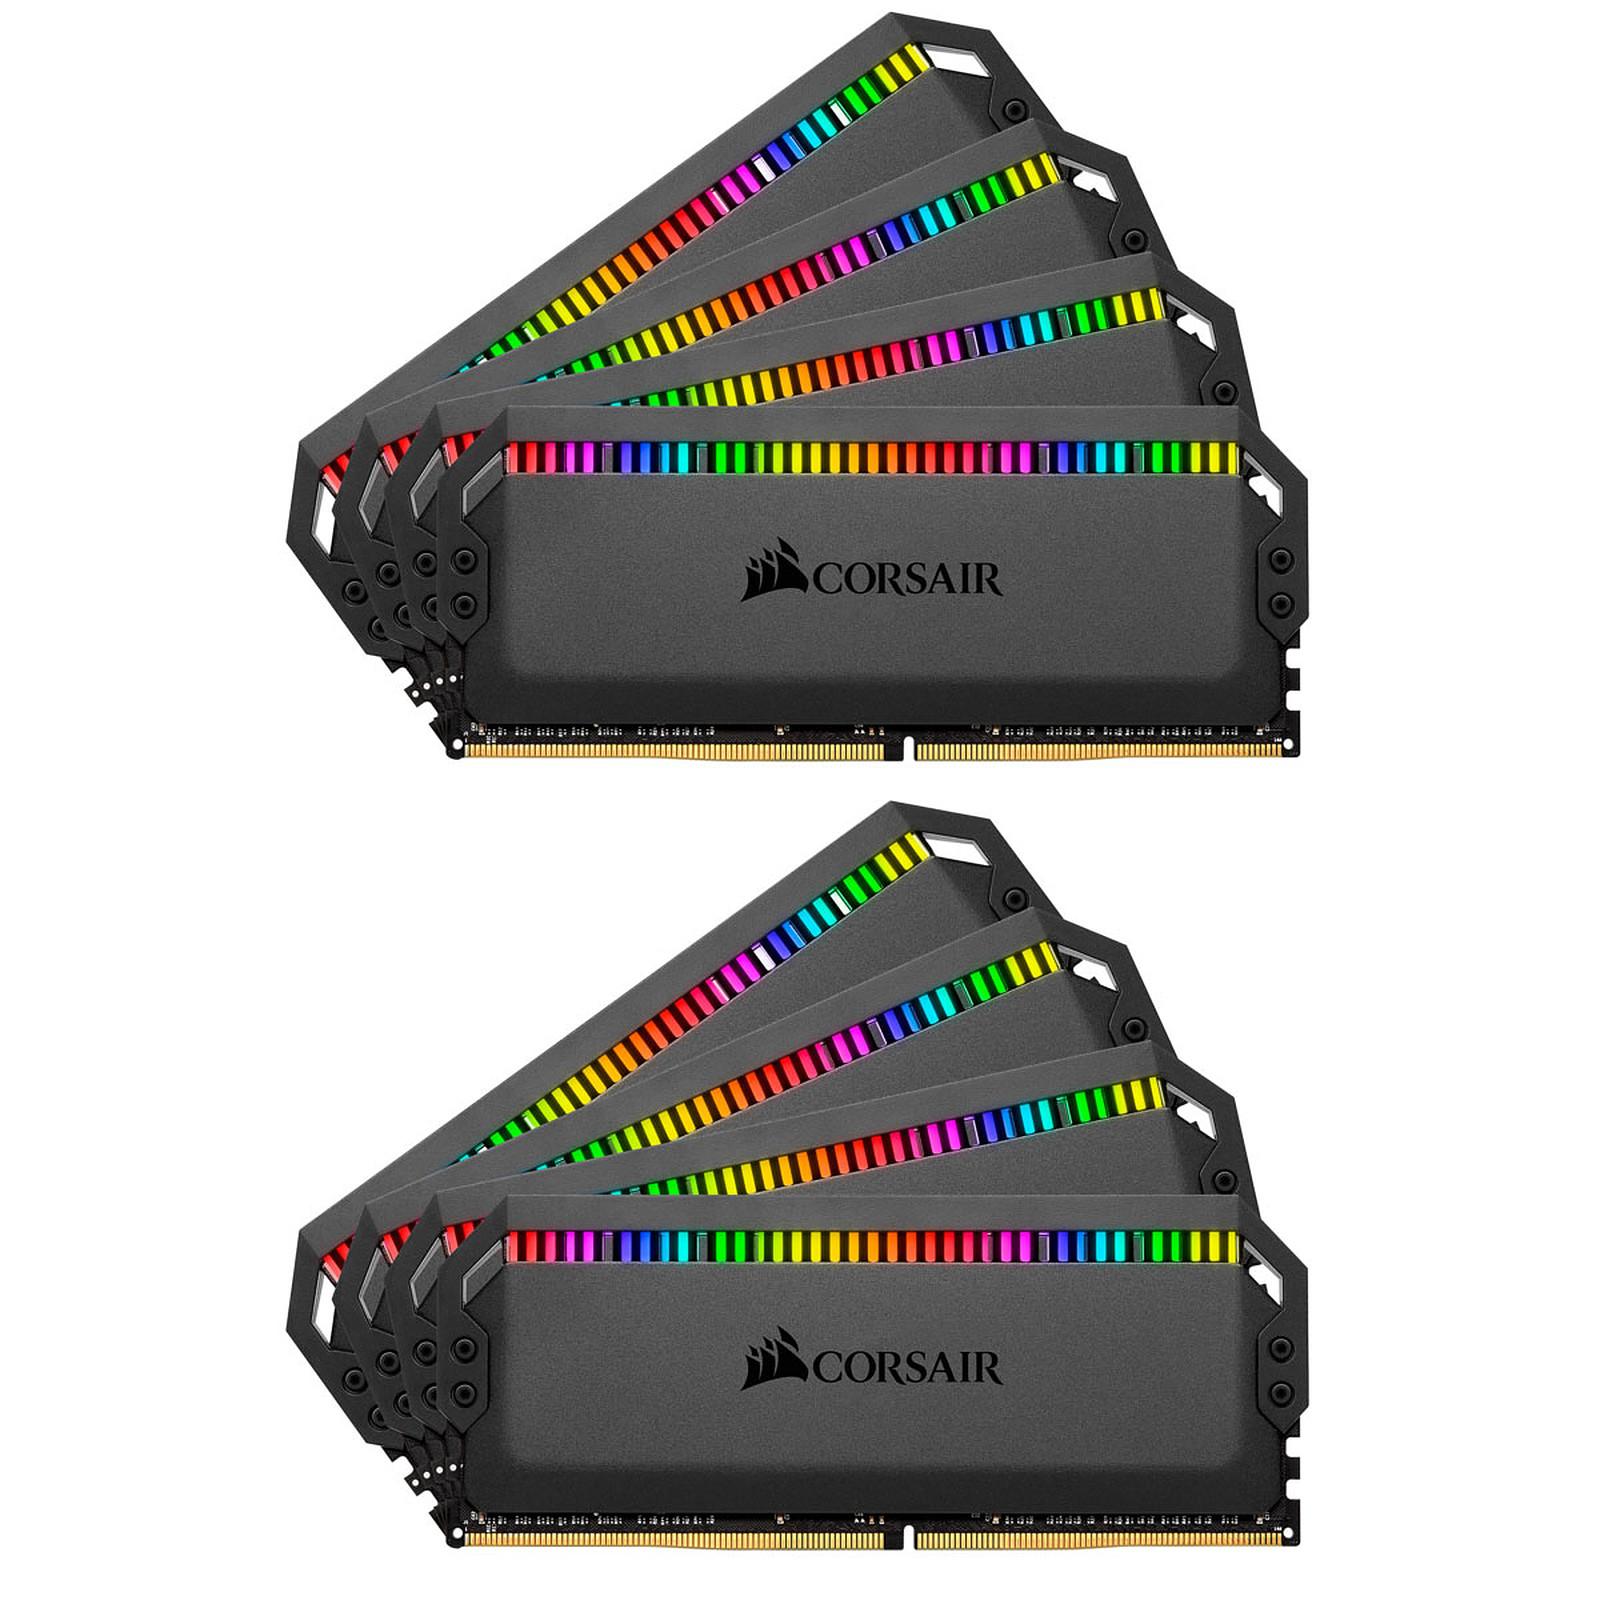 Corsair Dominator Platinum RGB 128 Go (8 x 16 Go) DDR4 3800 MHz CL19